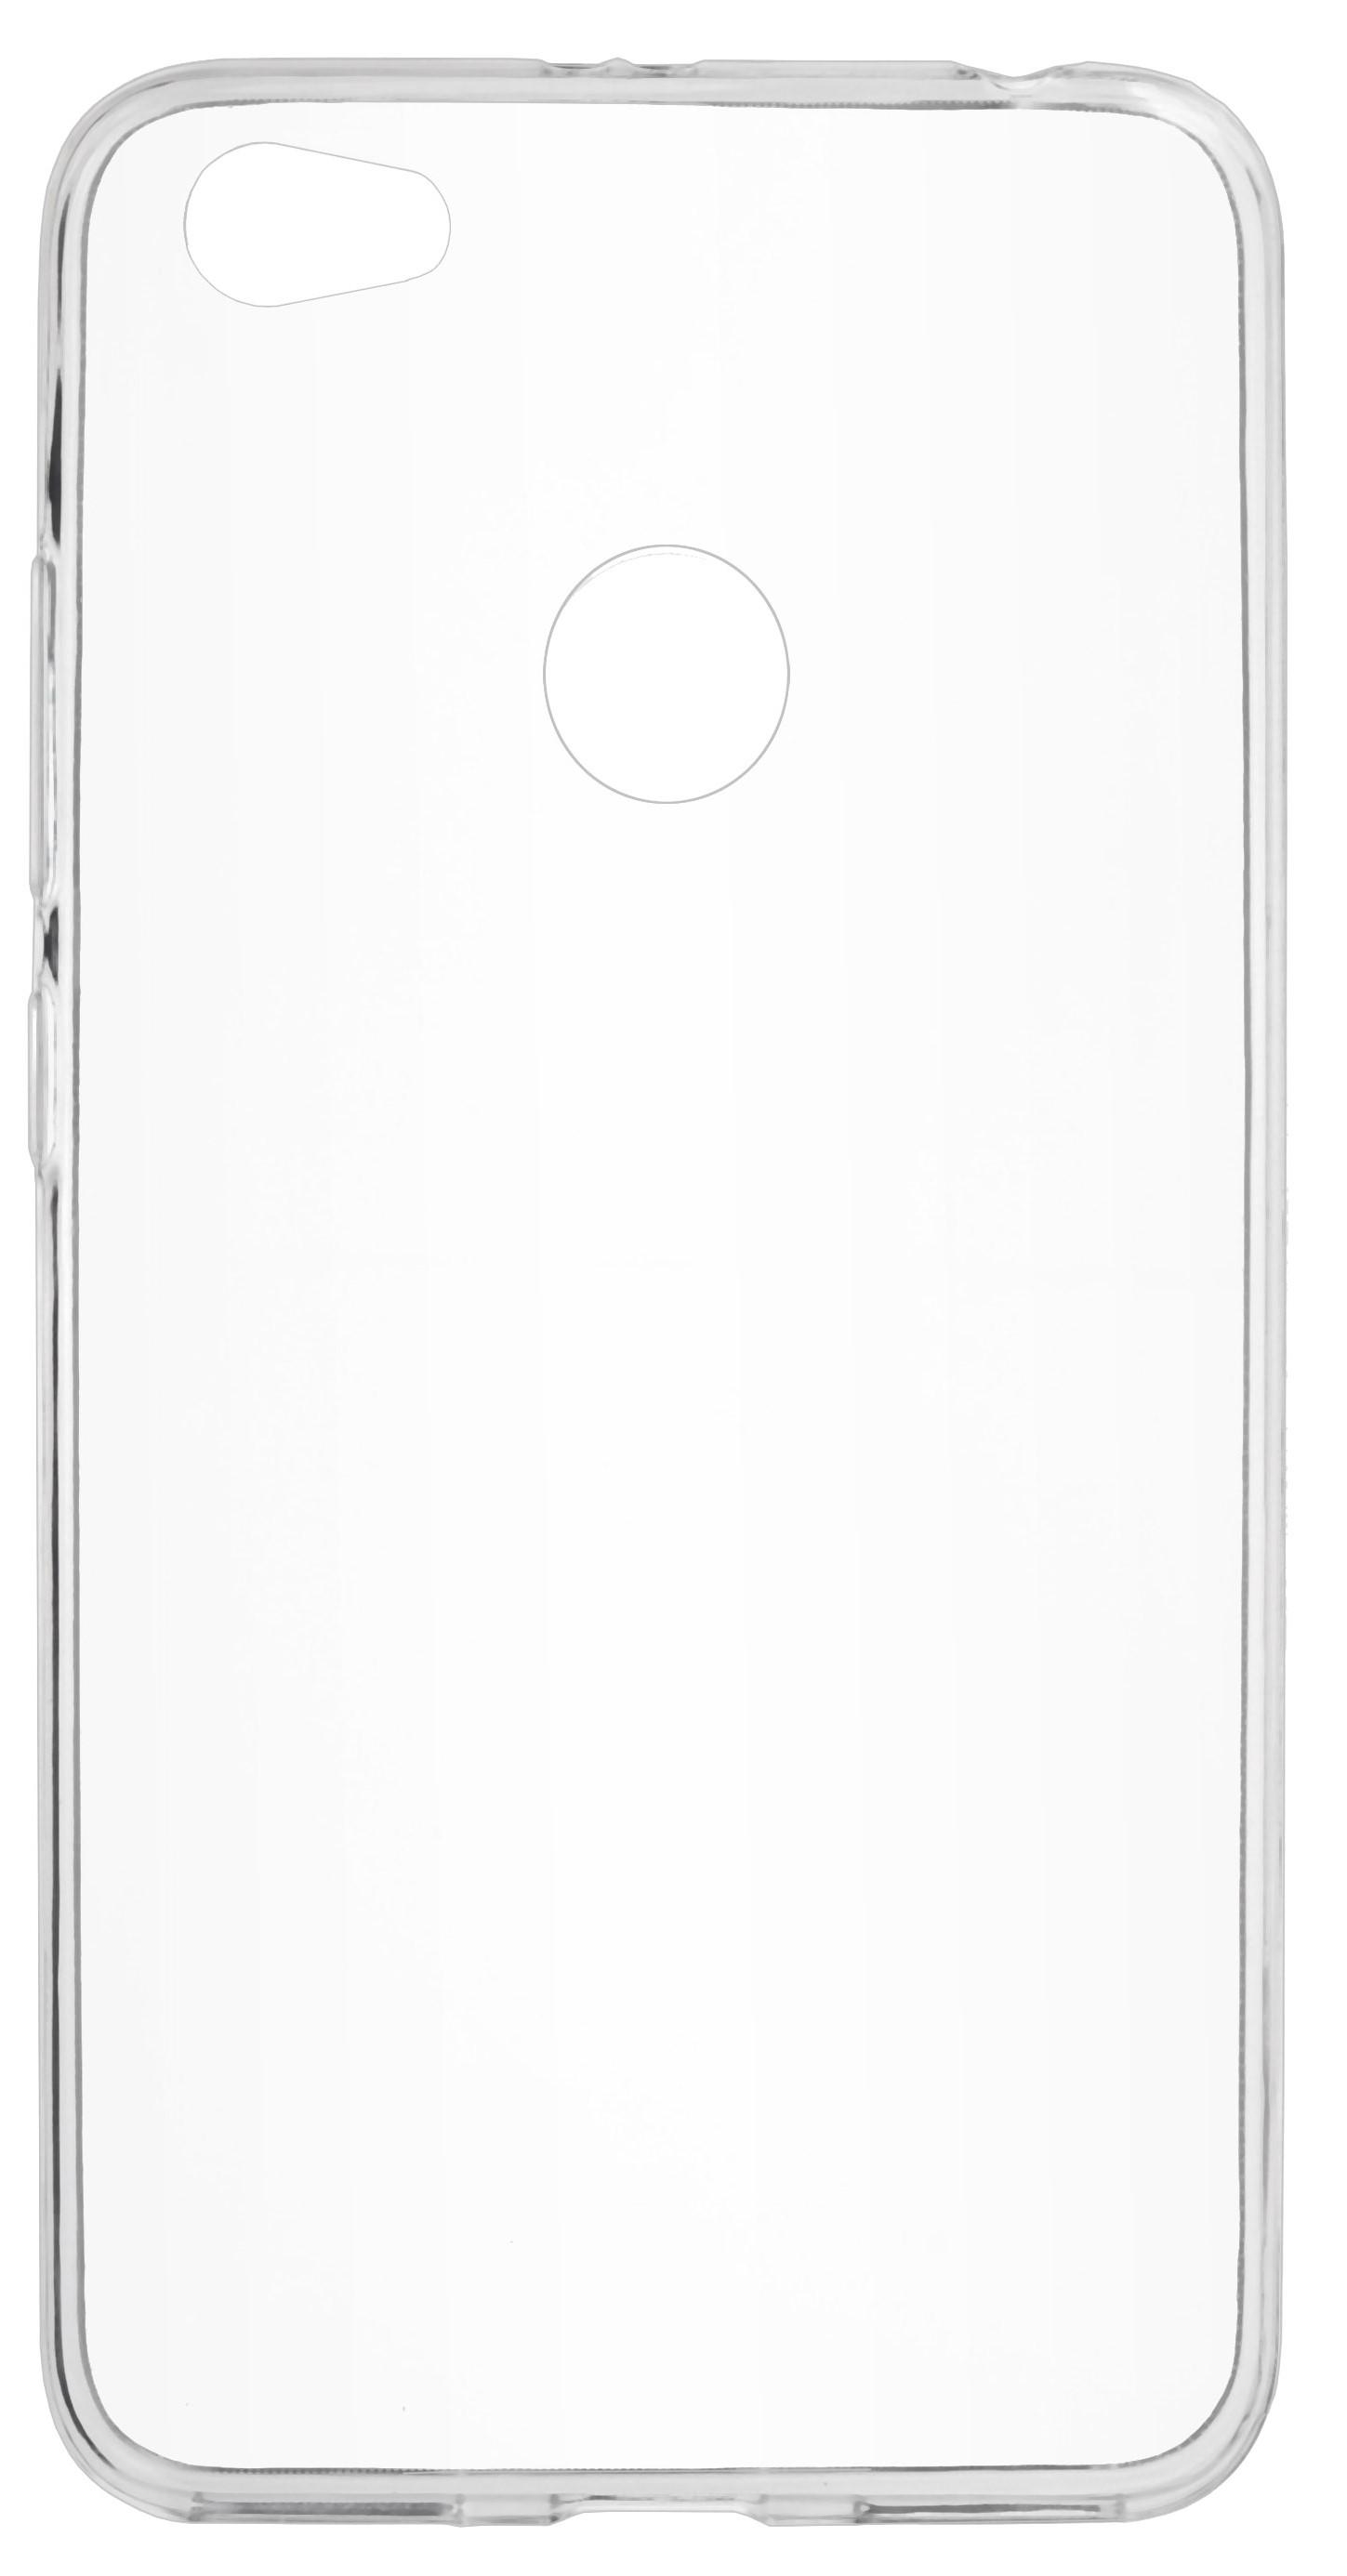 Чехол для сотового телефона skinBOX Slim Silicone, 4630042529854, прозрачный цена и фото